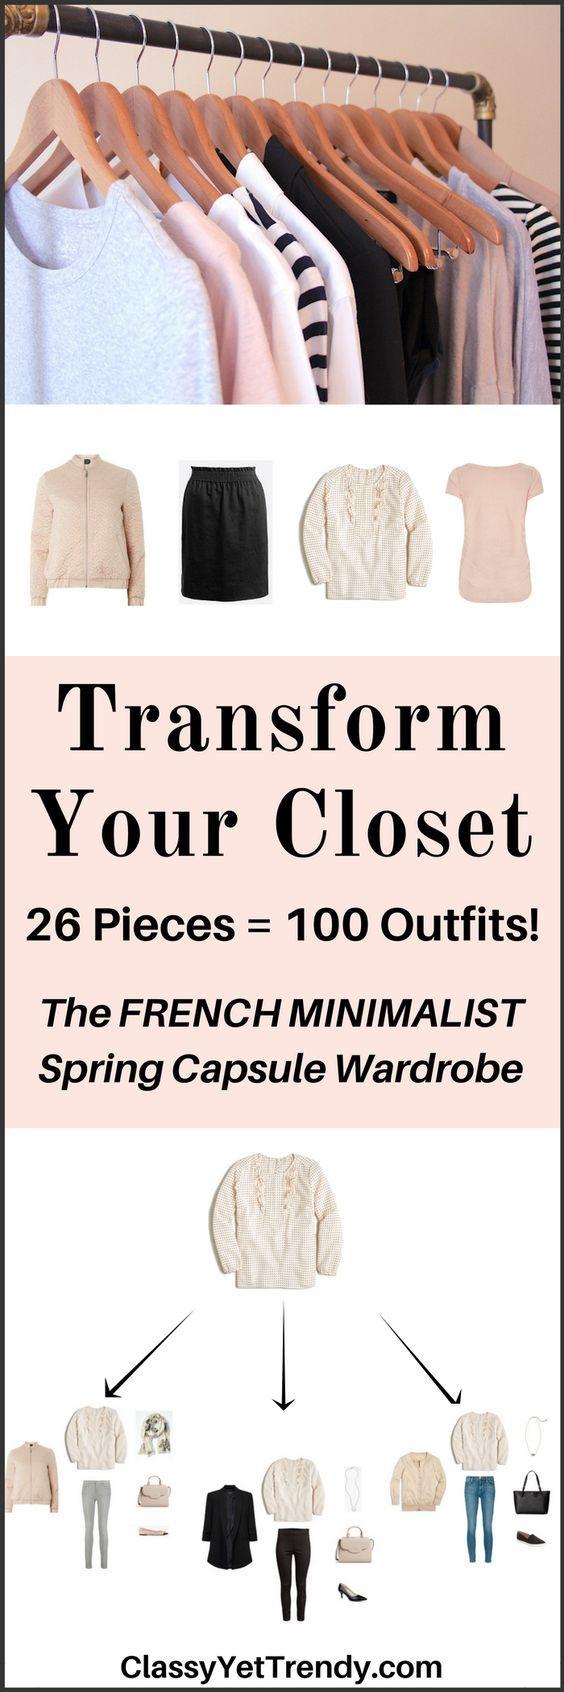 The French Minimalist Capsule Wardrobe: Spring 2017